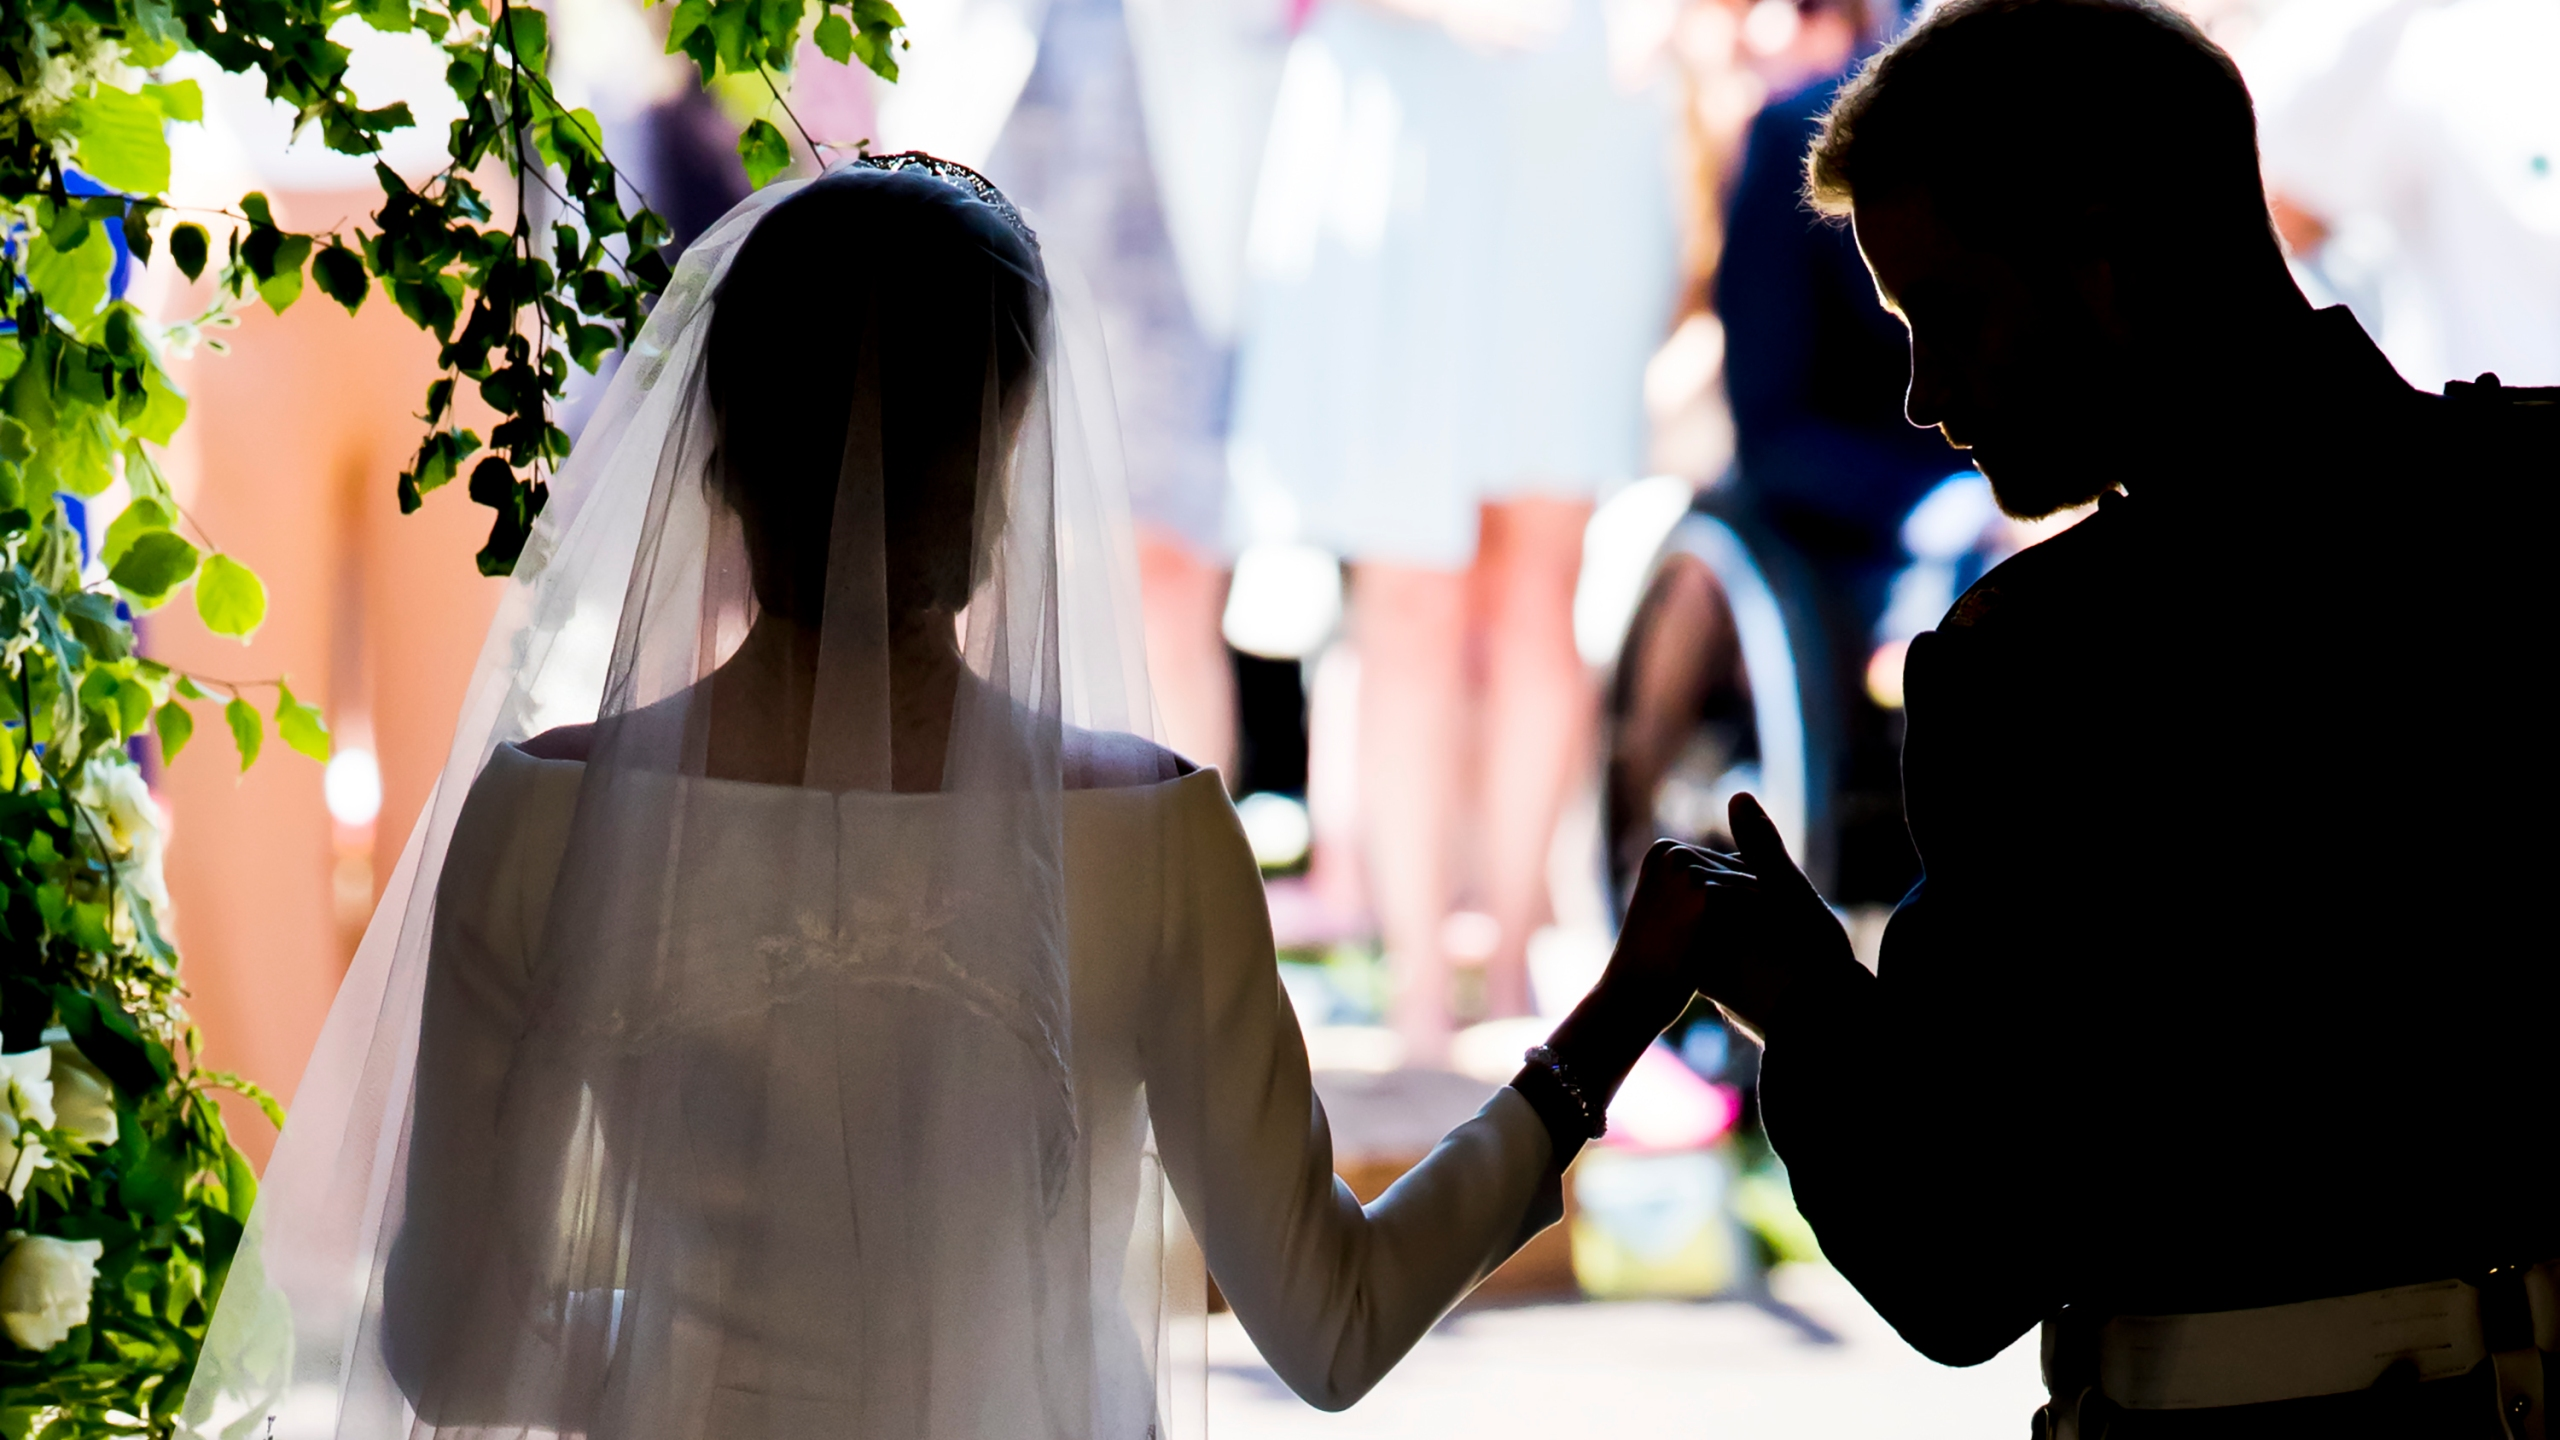 APTOPIX_Britain_Royal_Wedding_31591-159532.jpg90477414